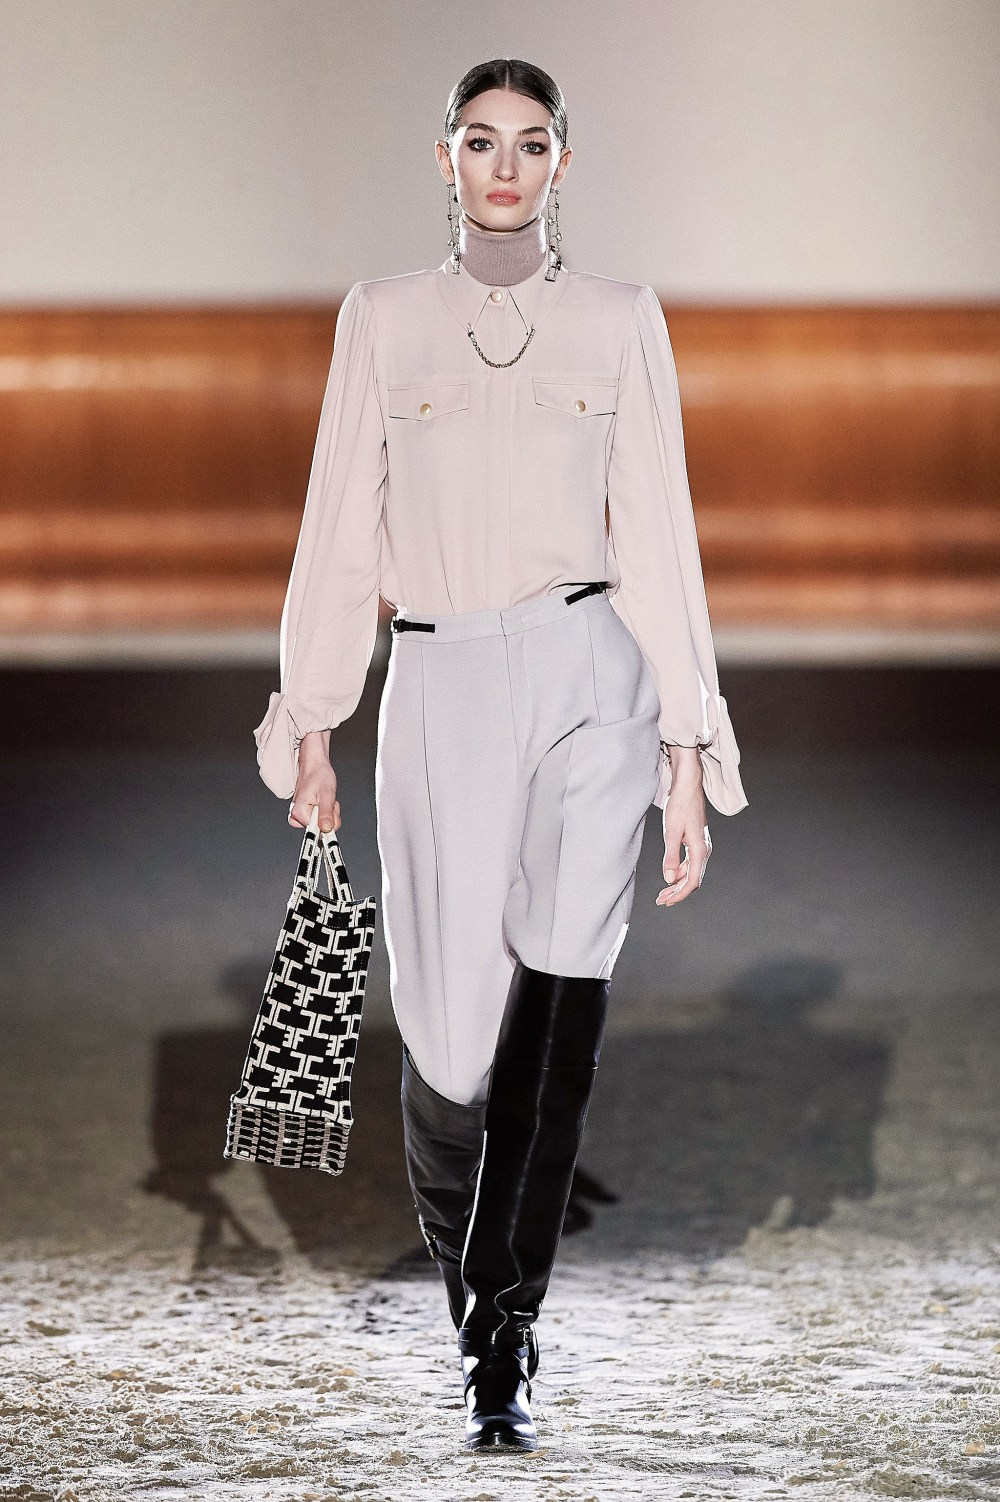 Elisabetta Franchi: Elisabetta Franchi Fall Winter 2021-22 Fashion Show Photo #31